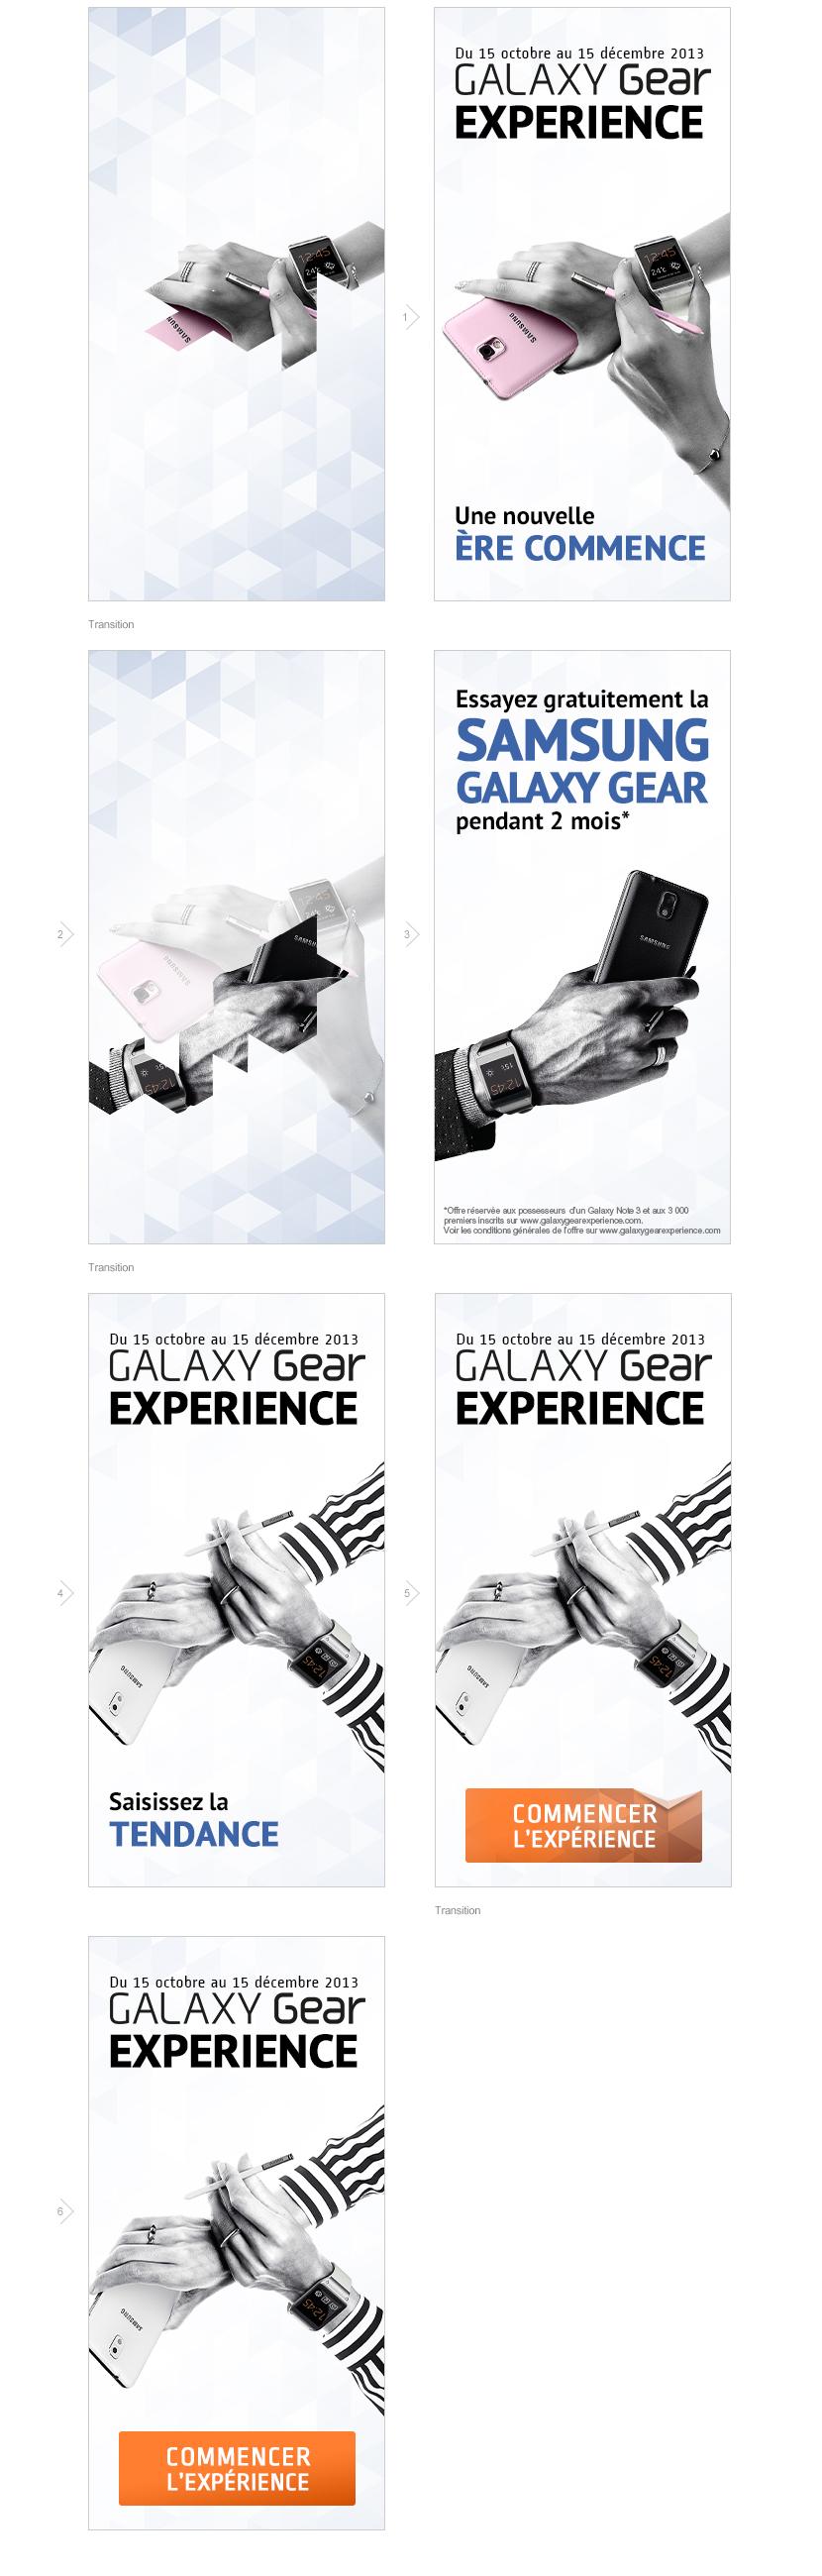 Samsung-galaxy-gear_Stephane-Chemin-Directeur-Artistique-Graphiste-freelance_01